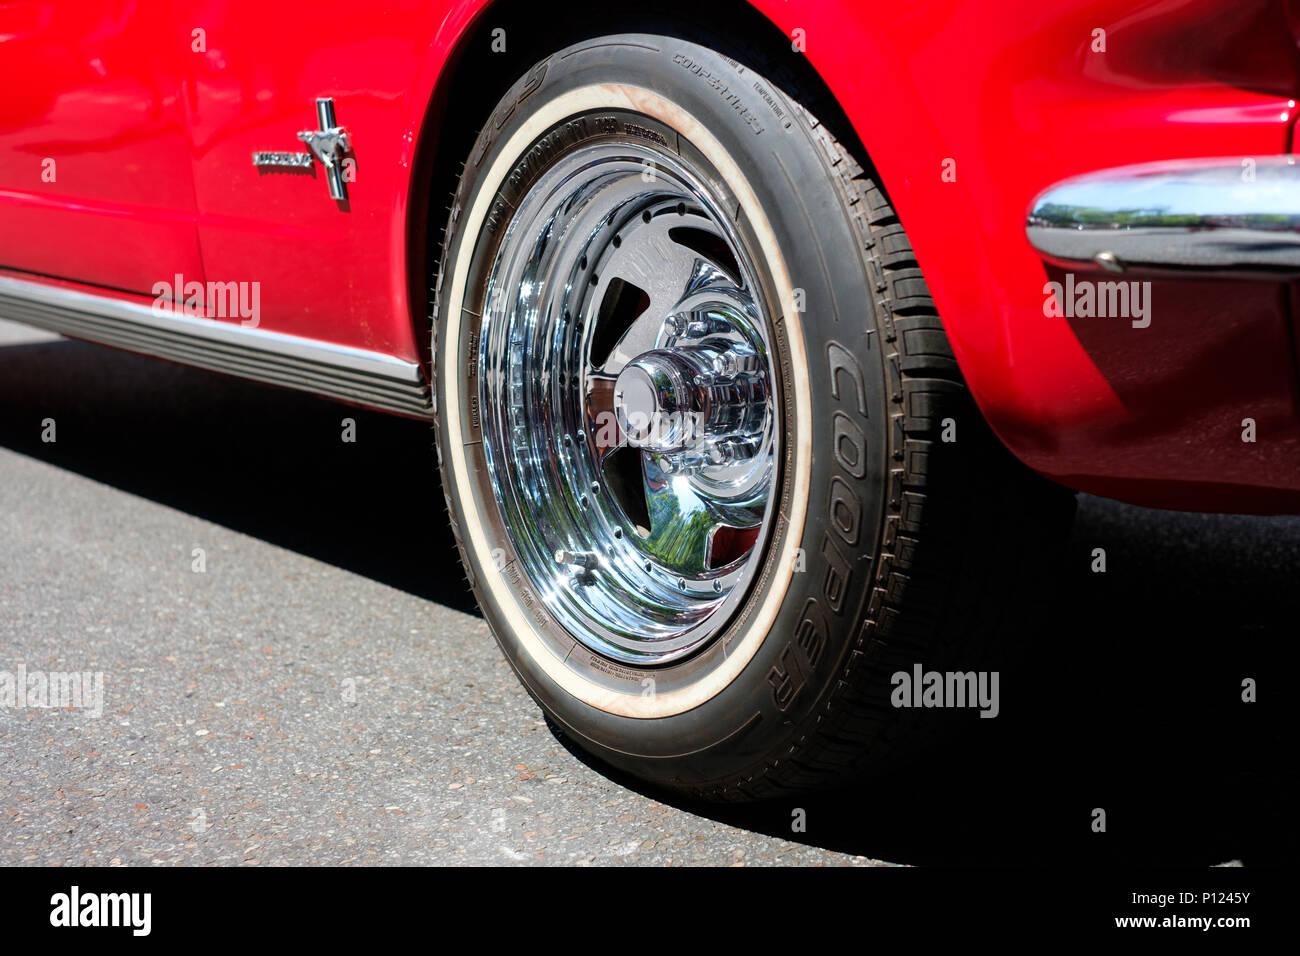 Berlin, Deutschland - Juni 09, 2018: Felge/Reifen Nahaufnahme des klassischen Reed oldtimer Ford Mustang Auto Stockbild